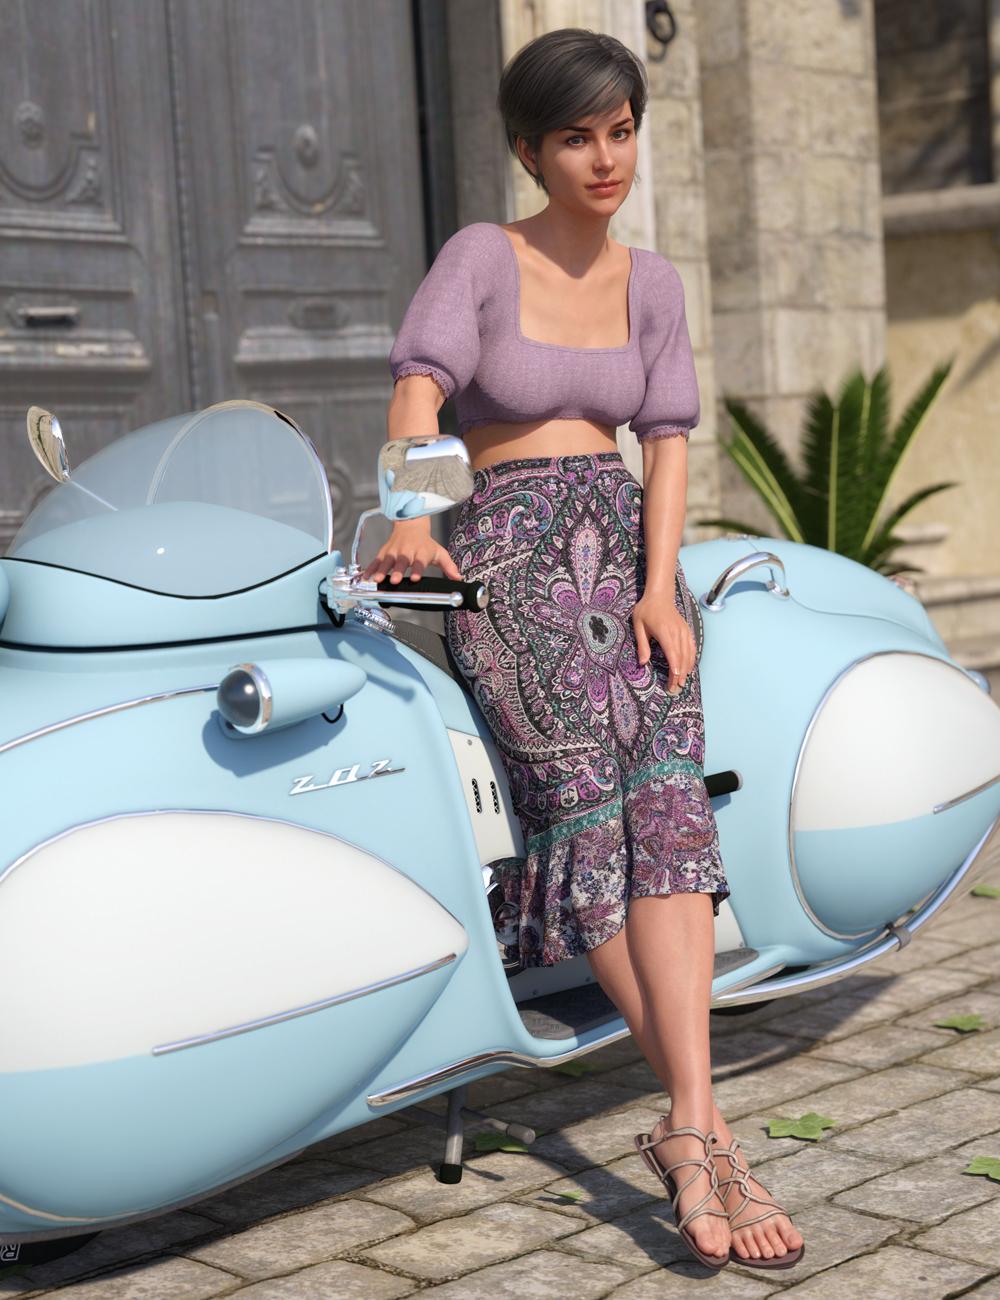 dForce Boho Ruffle Dress for Genesis 8 Female(s) by: Barbara BrundonDirtyFairy, 3D Models by Daz 3D